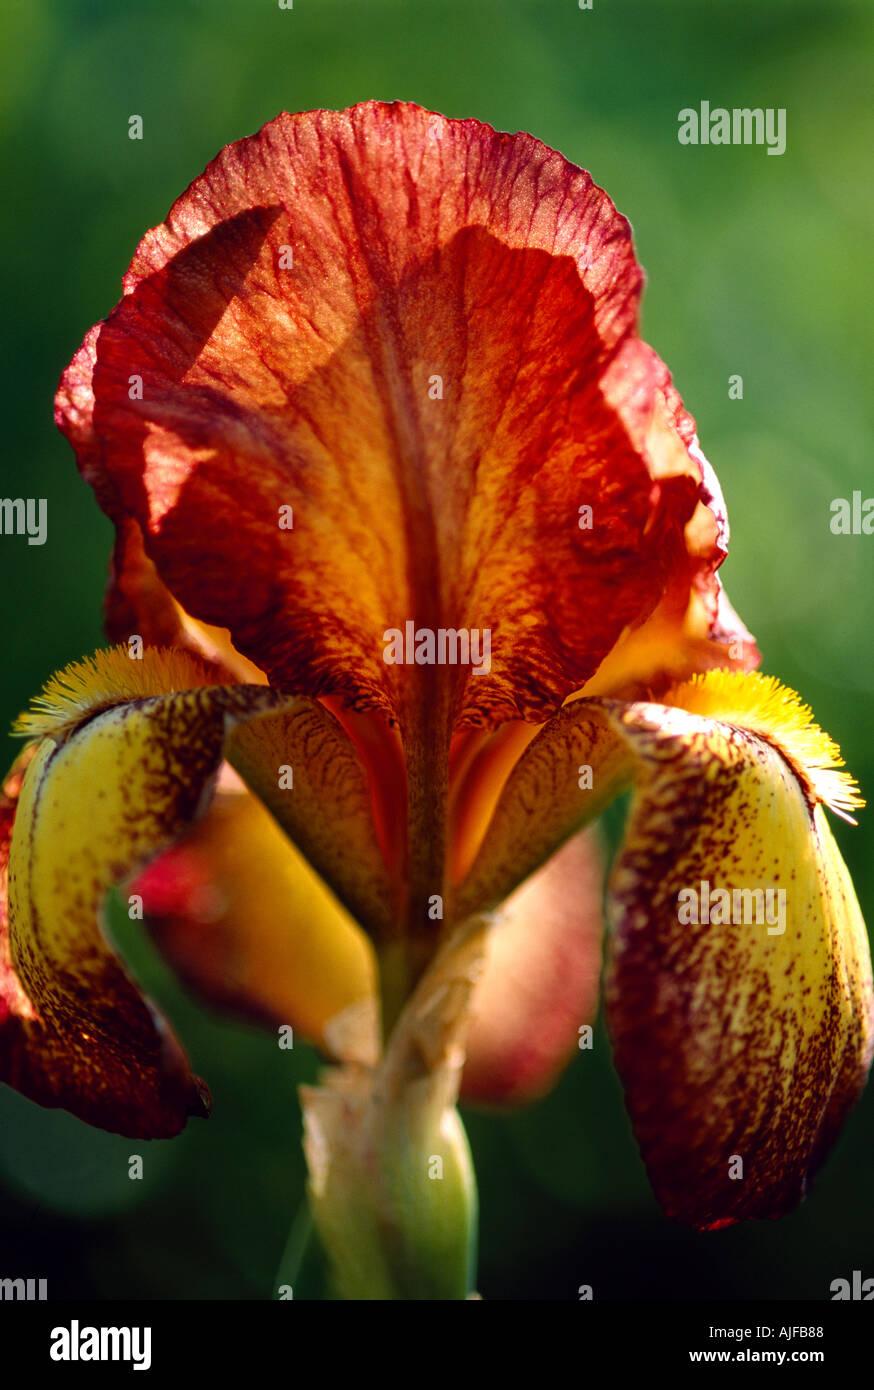 Iris Goddess Of Rainbow Stock Photos & Iris Goddess Of Rainbow Stock ...